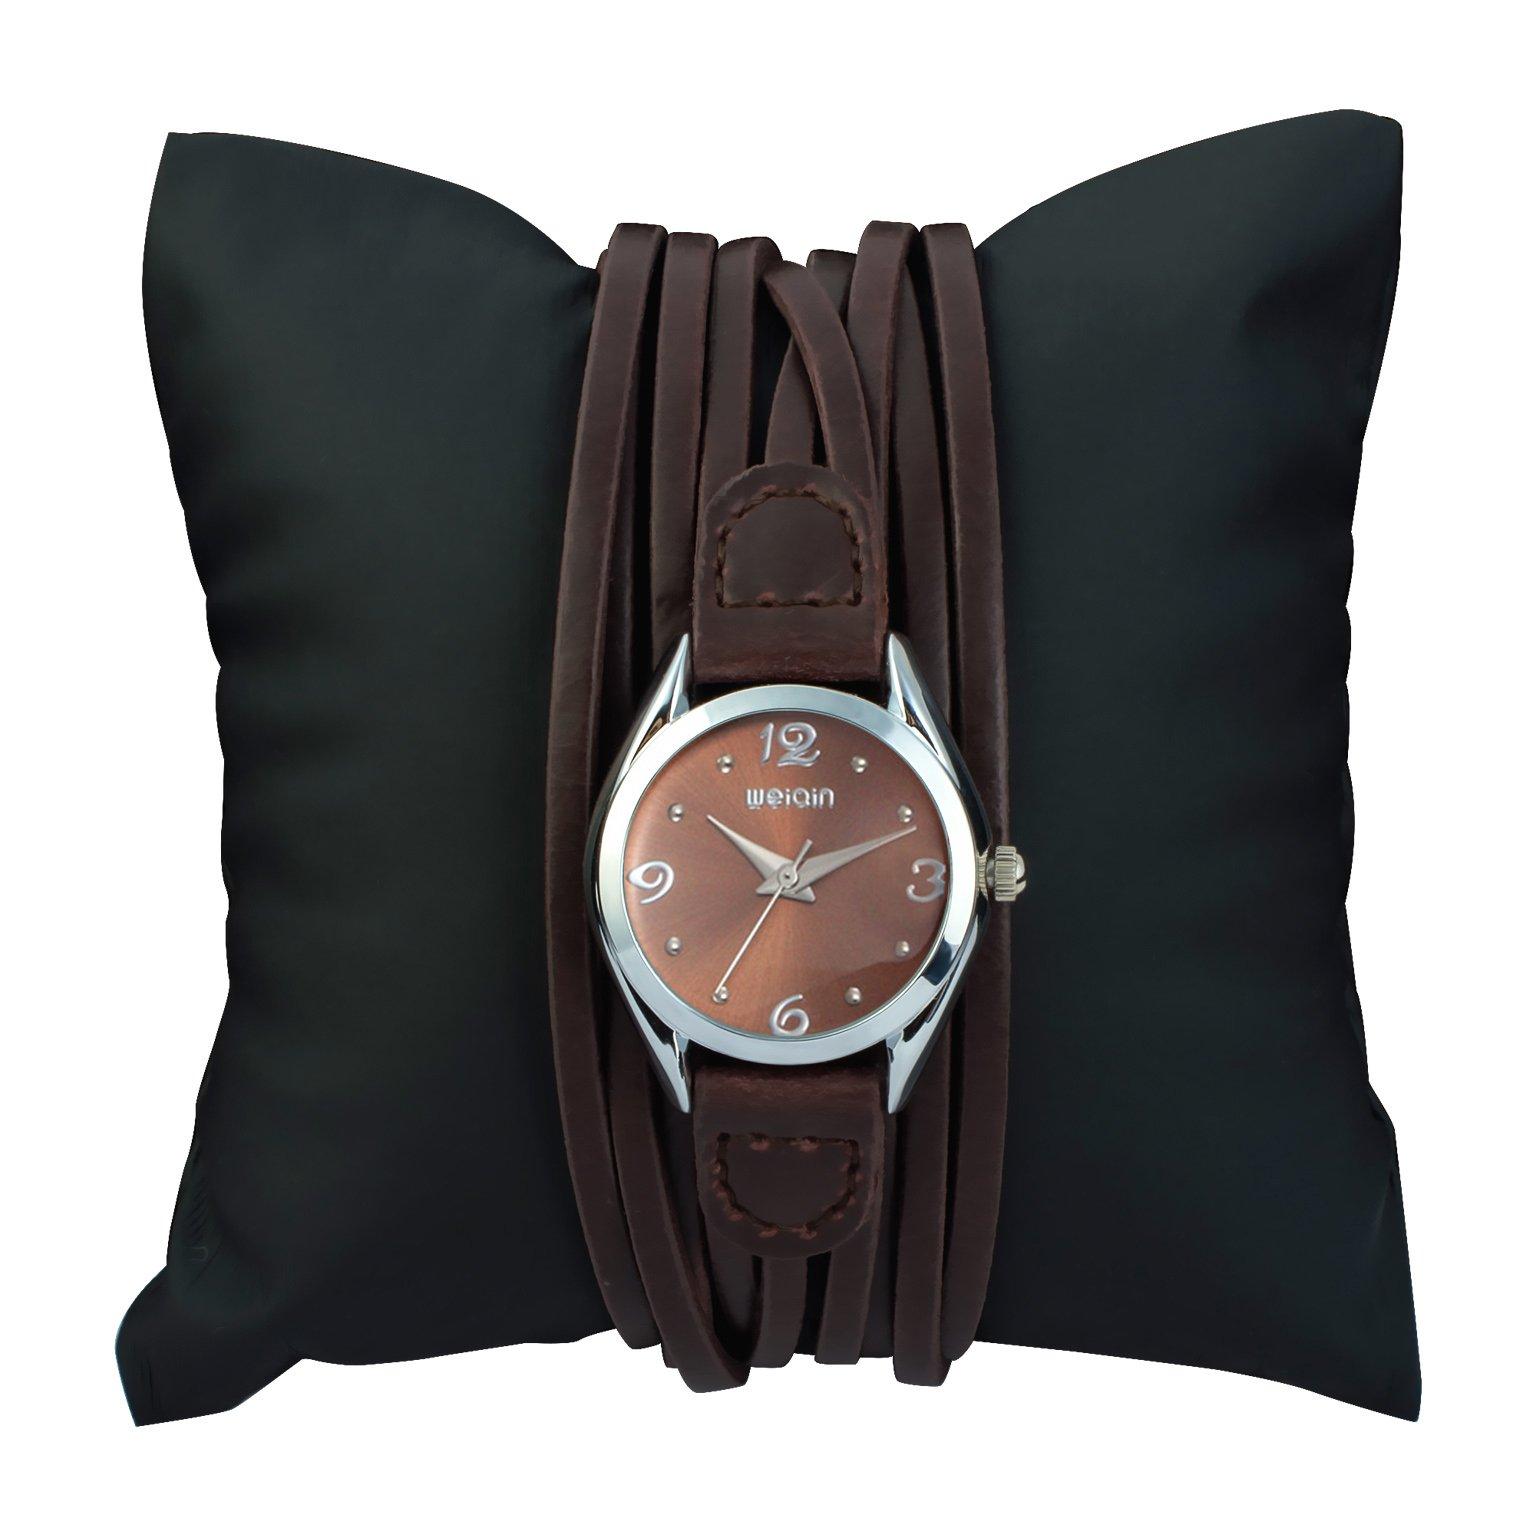 Ladies Water Resistant Leather Wrist Watch for Women - Female Vintage Brown